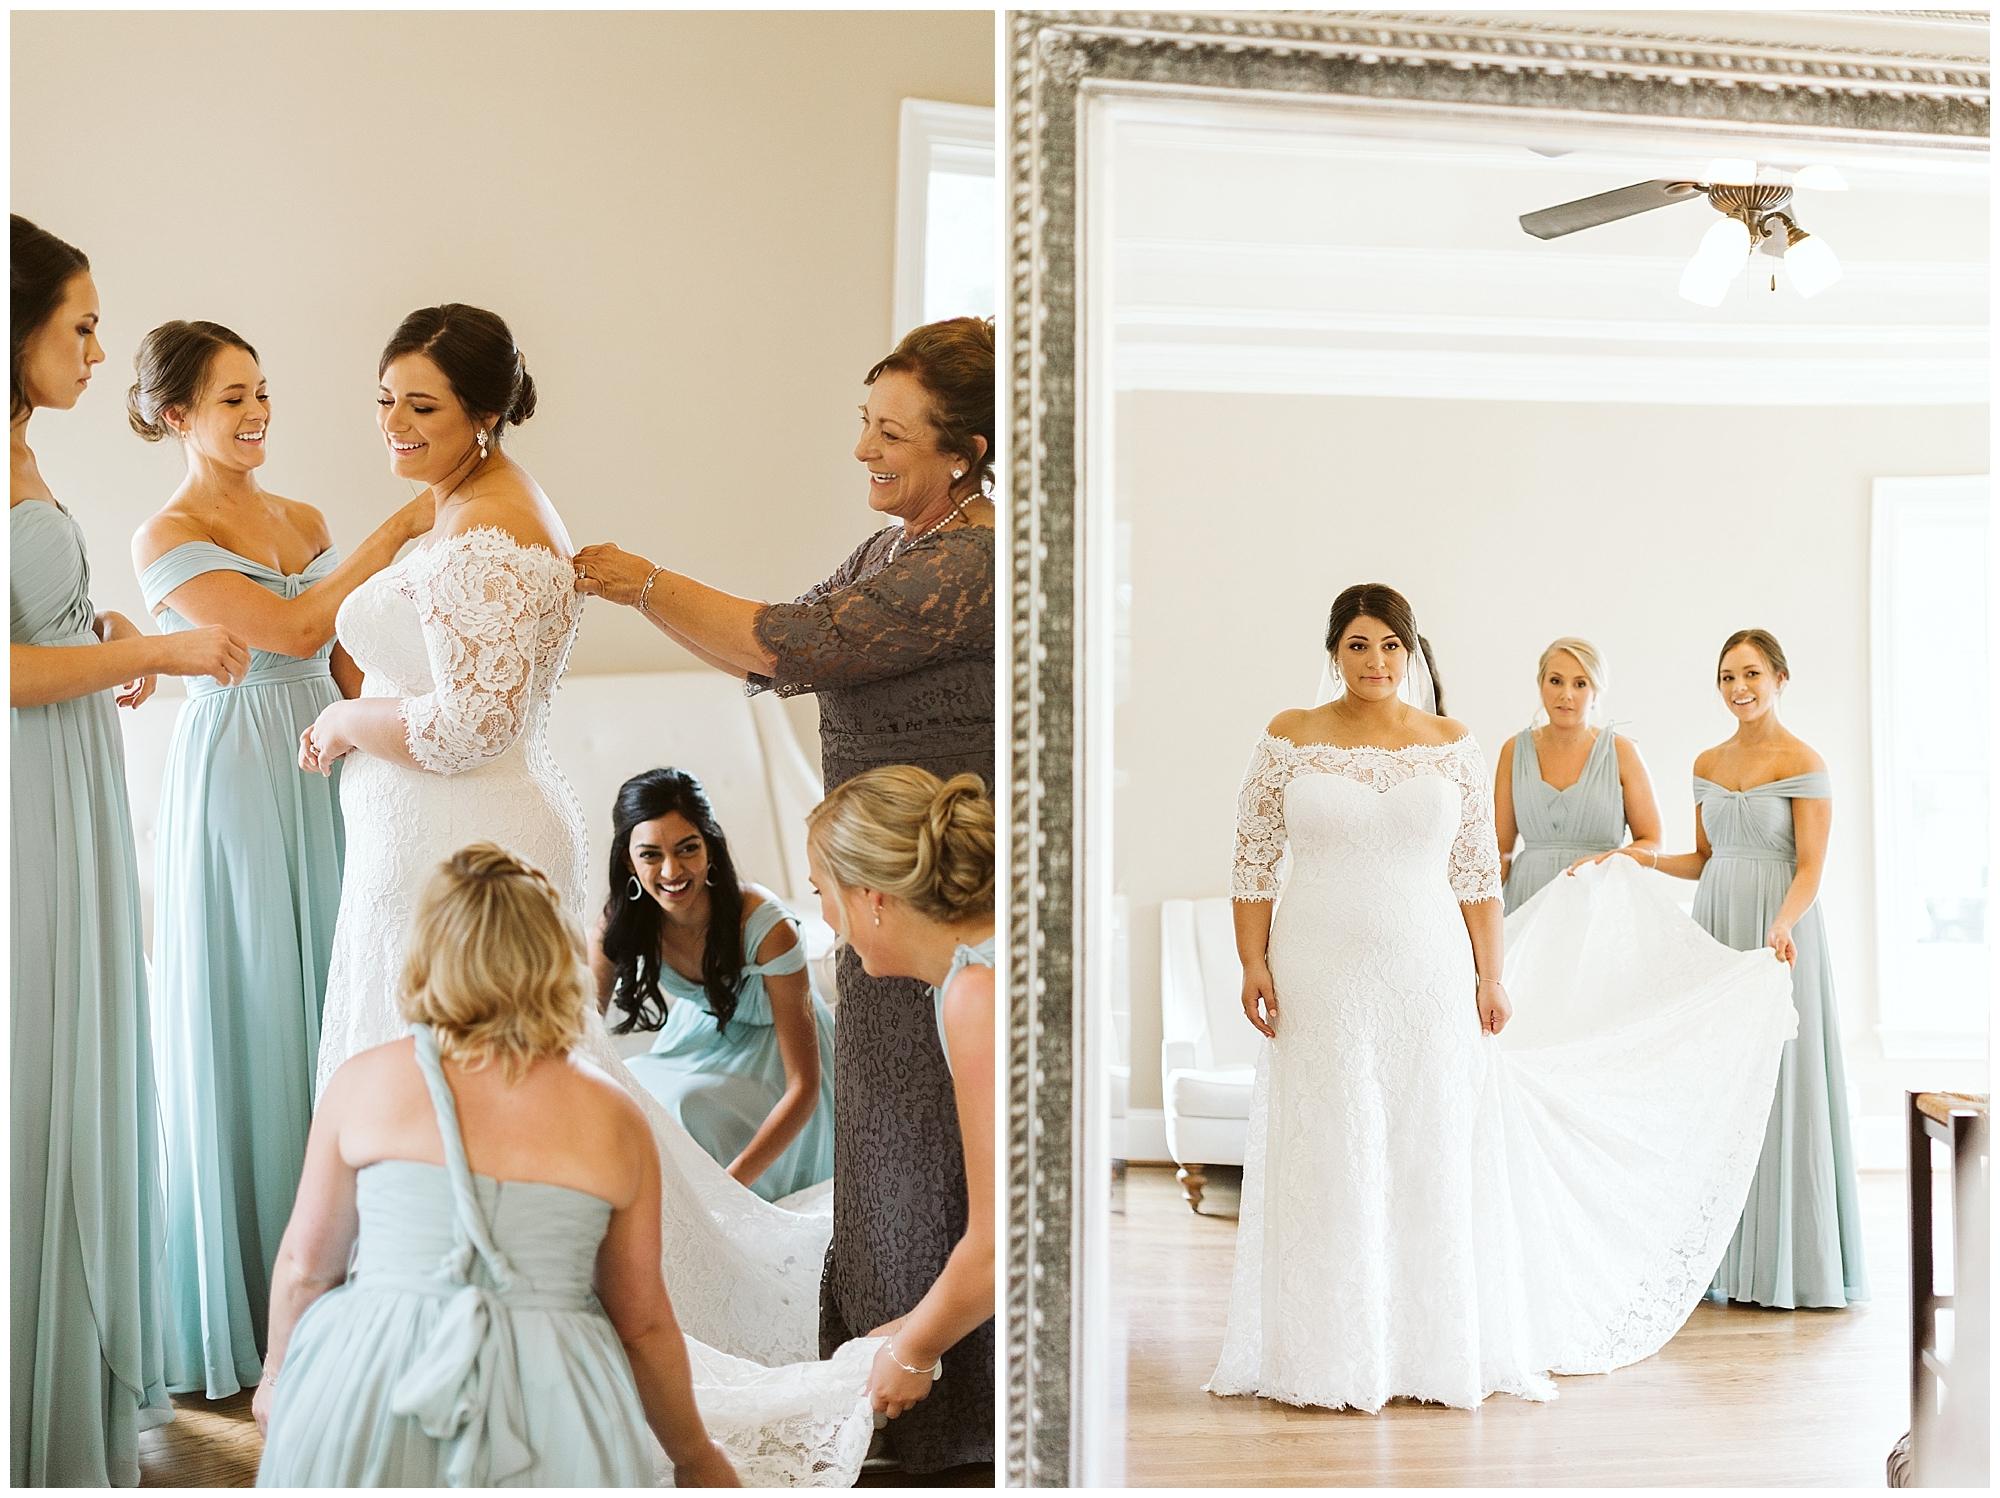 Oaks-at-salem-wedding-apex-photography-44.jpg